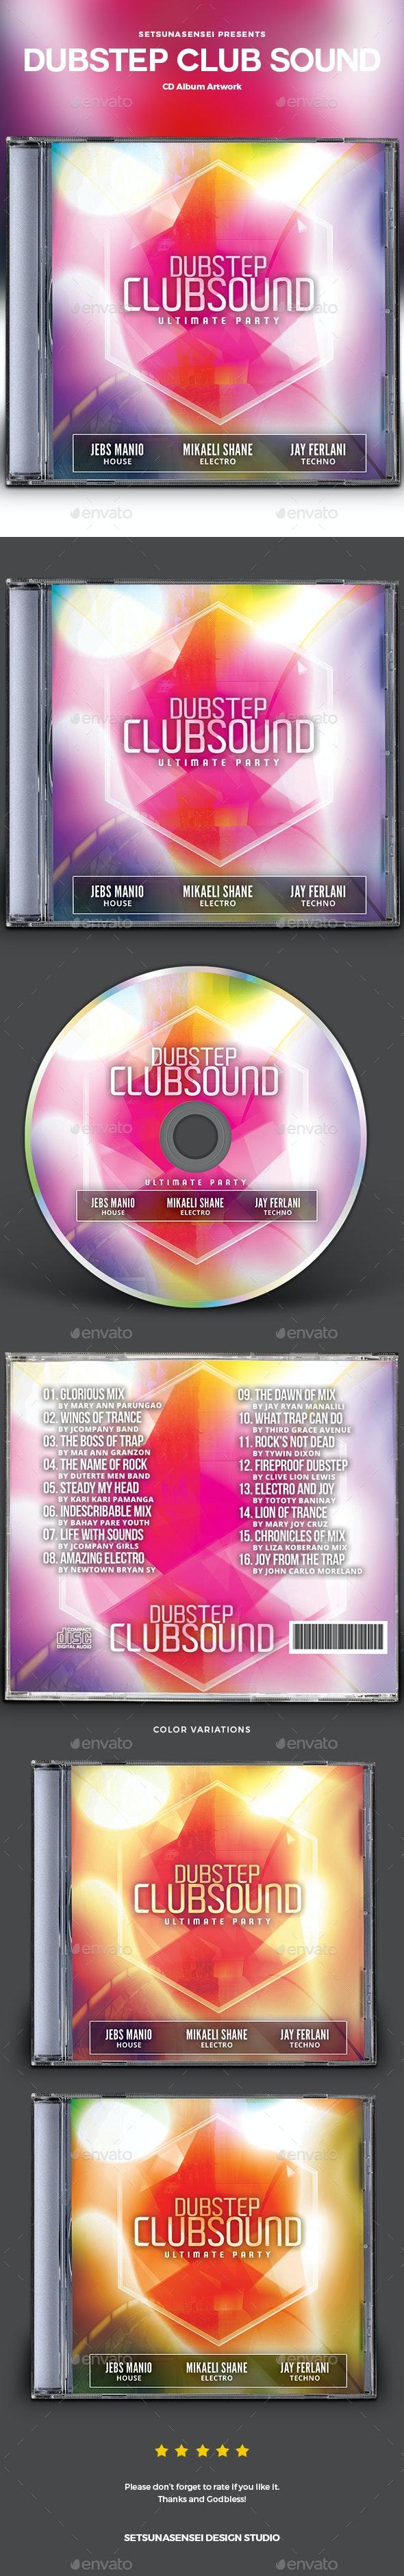 Dubstep Club Sound CD Album Artwork - CD & DVD Artwork Print Templates